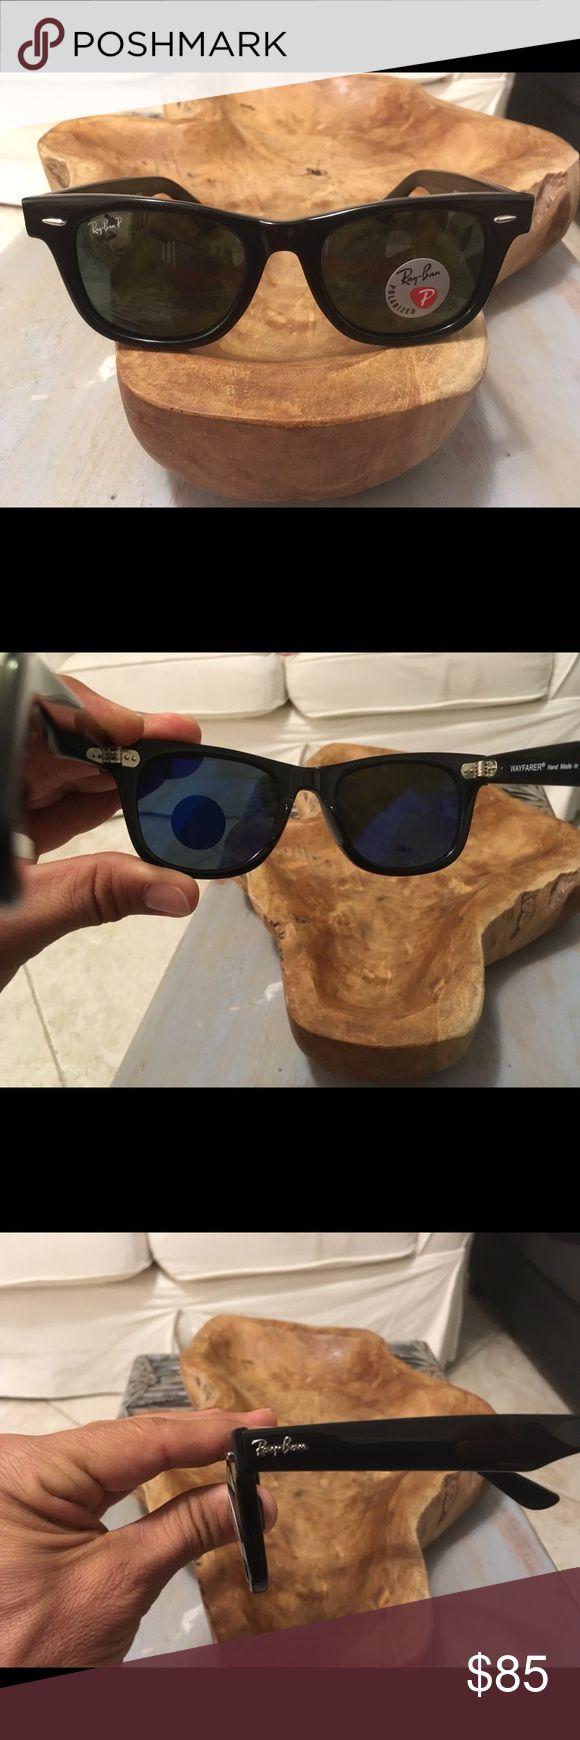 Ray ban wayfarer polarized glass lenses Brand new ray ban wayfarer polarized glass lenses  Size 50mm Ray-Ban Accessories Sunglasses